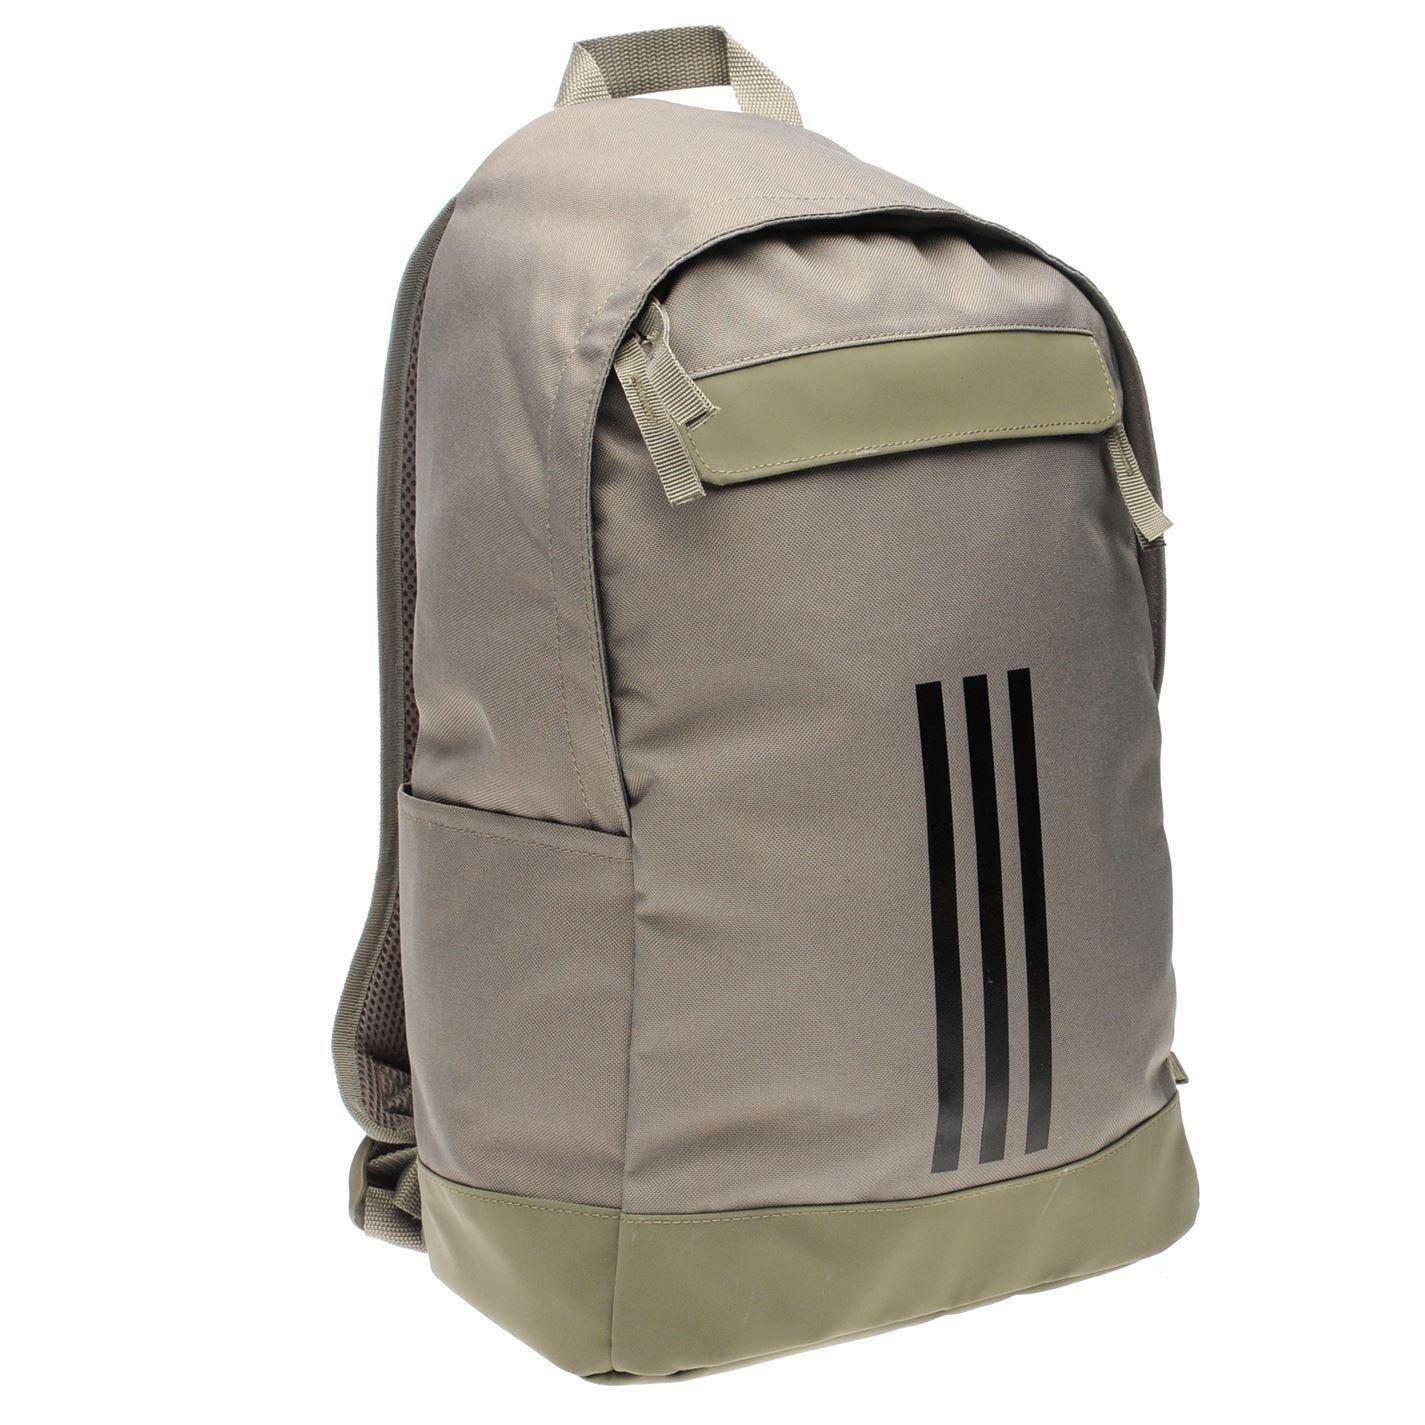 d0cd44ae4d ruksak adidas Classic 3 Stripe Backpack Bež - Jeftinije.hr